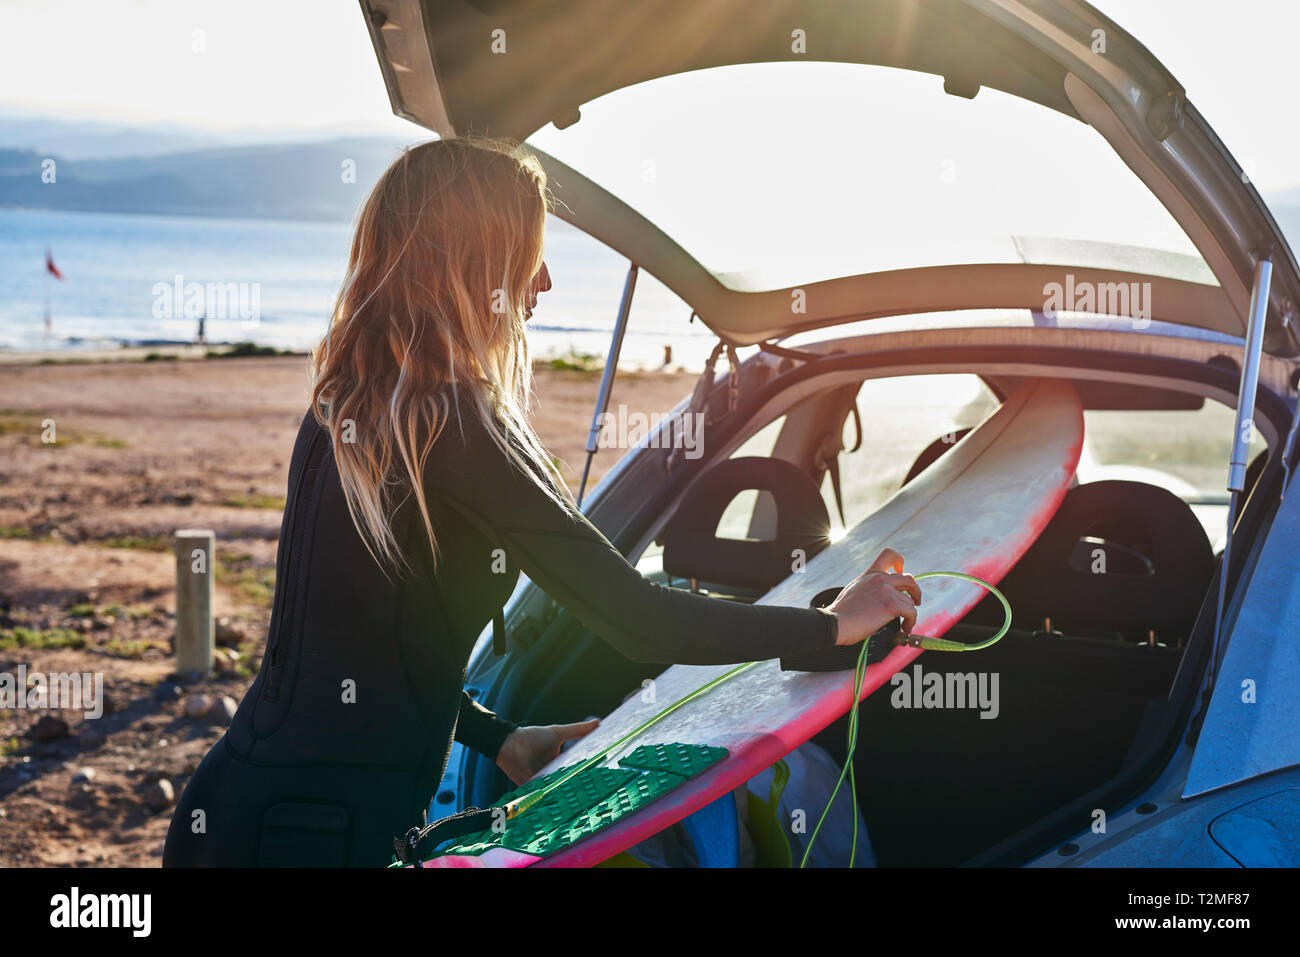 Junge Frau surfboard Entfernen aus dem Kofferraum Stockfoto